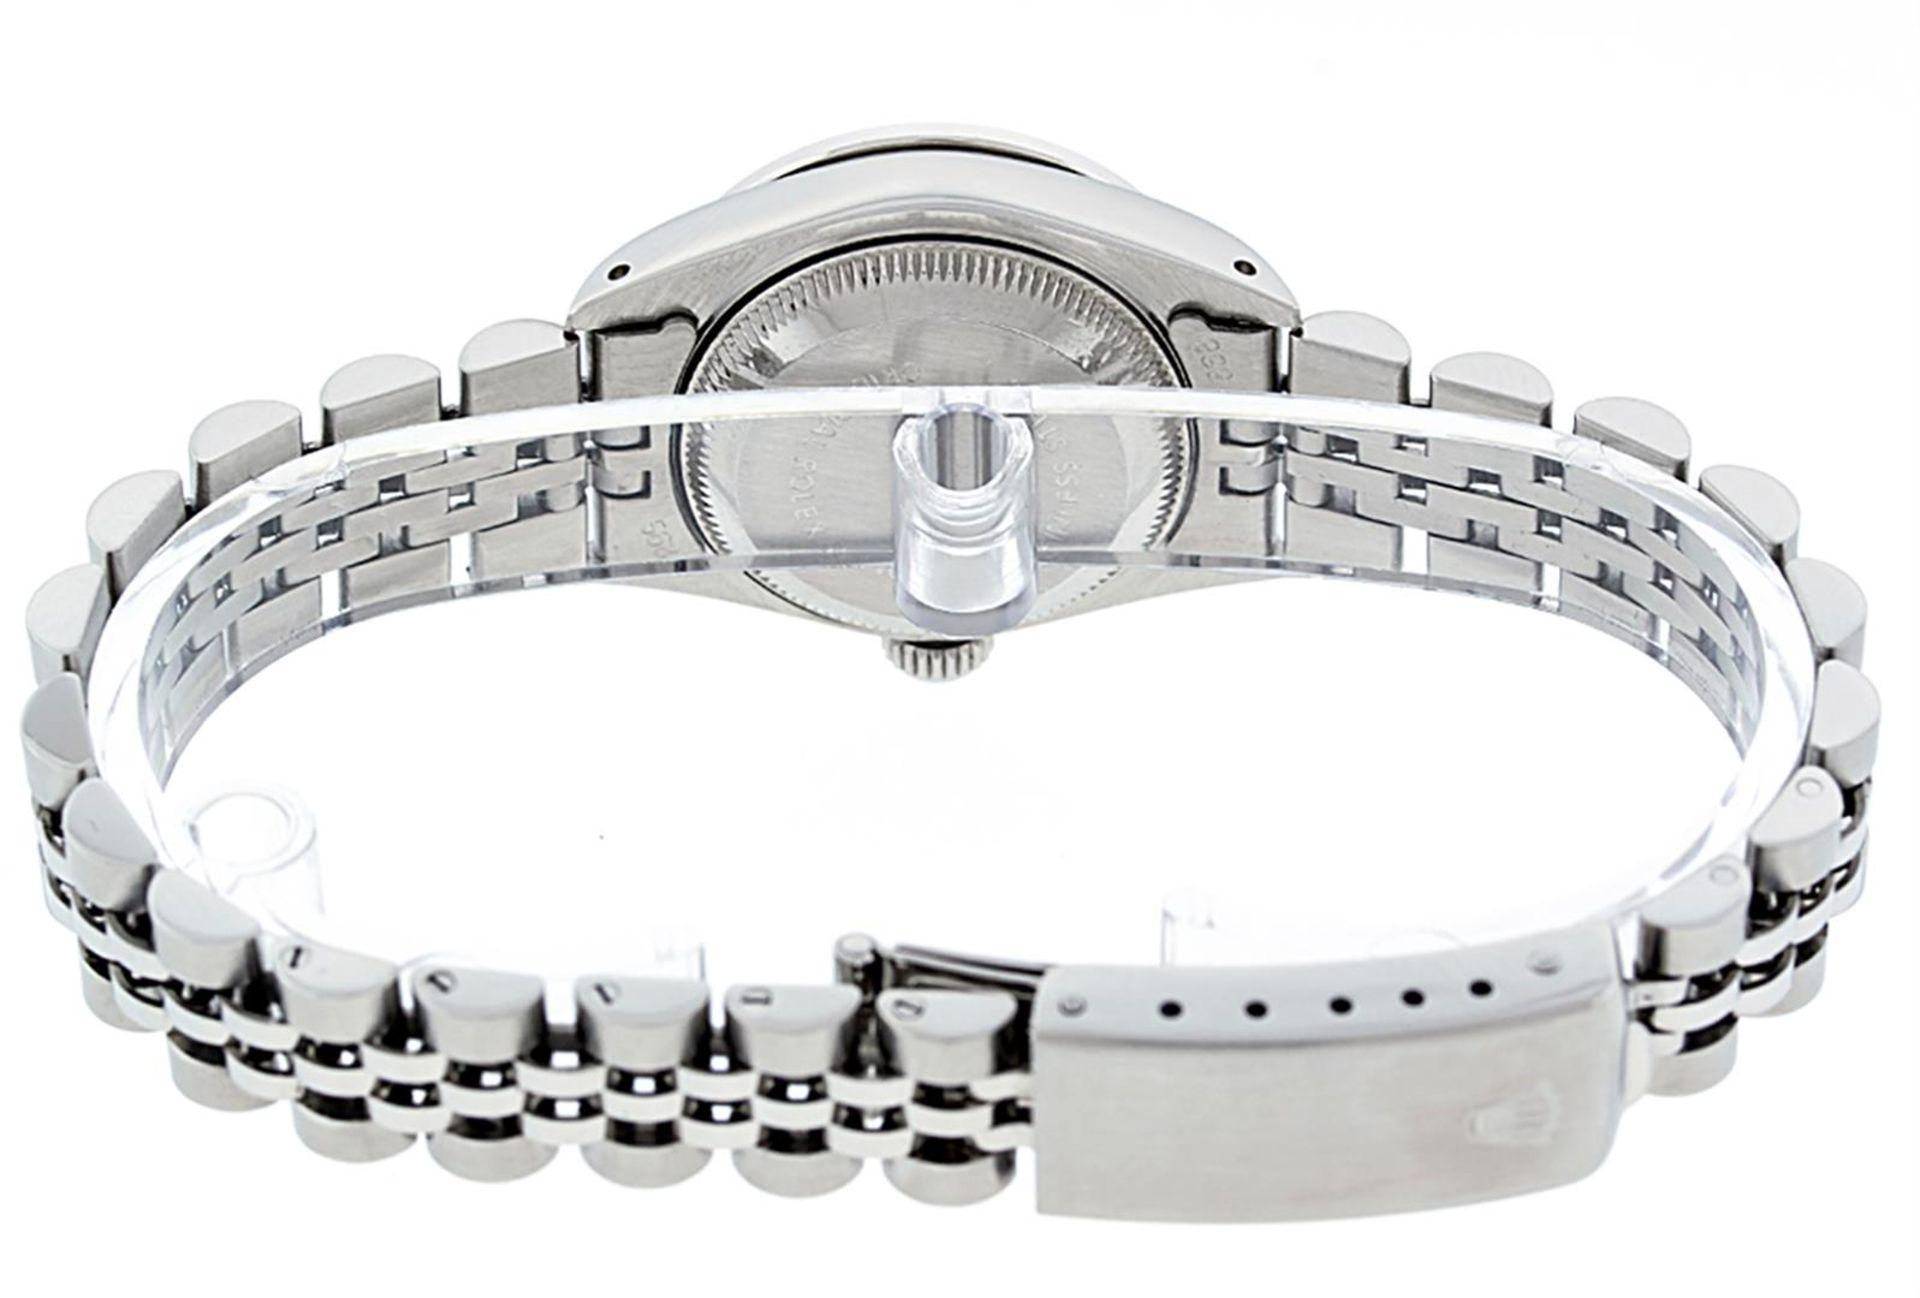 Rolex Ladies Stainless Steel 26MM Orange String Diamond Lugs Datejust Wristwatch - Image 6 of 9